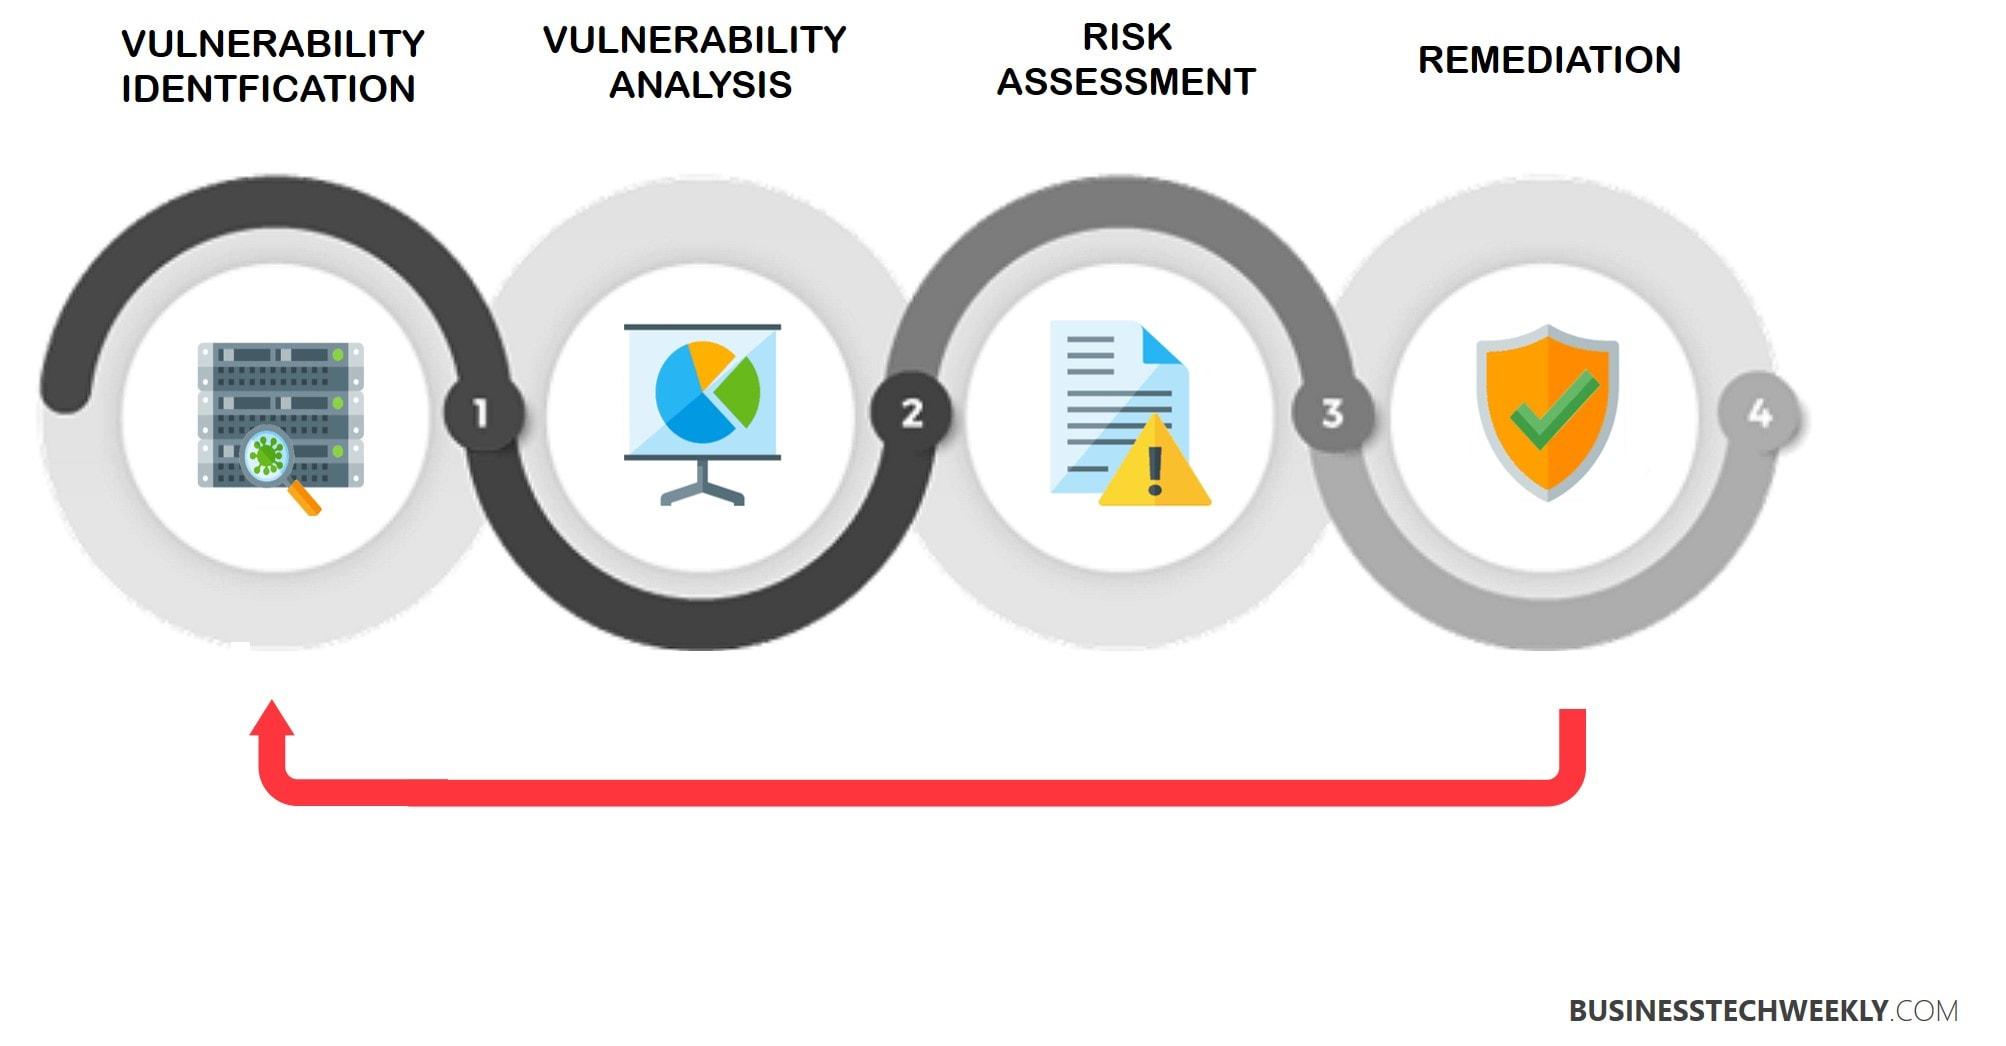 Vulnerability Assessment - Evaluating Vulnerabilities